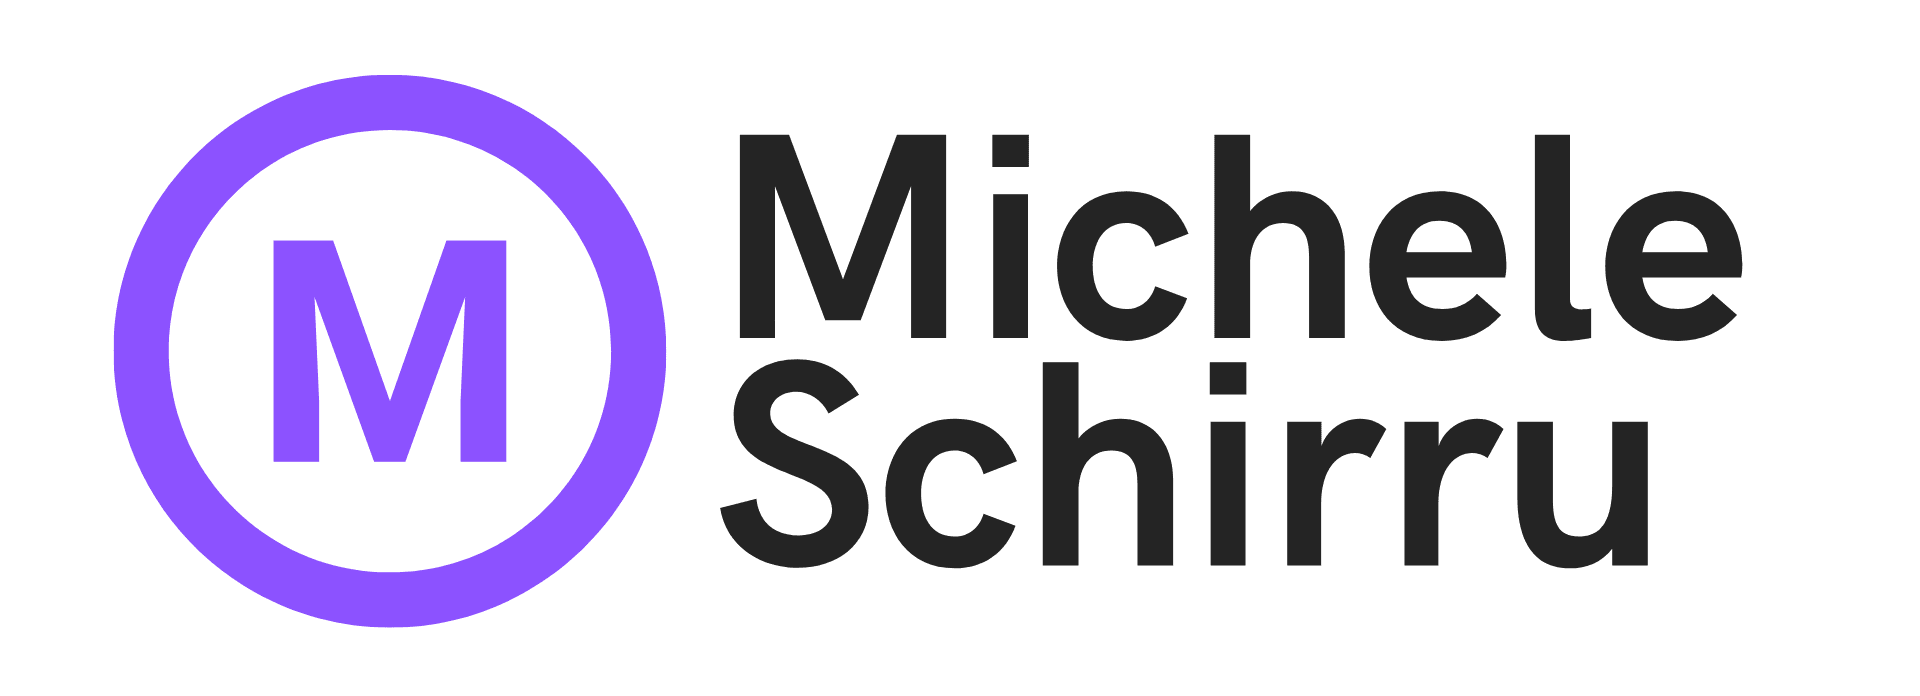 Michele Schirru